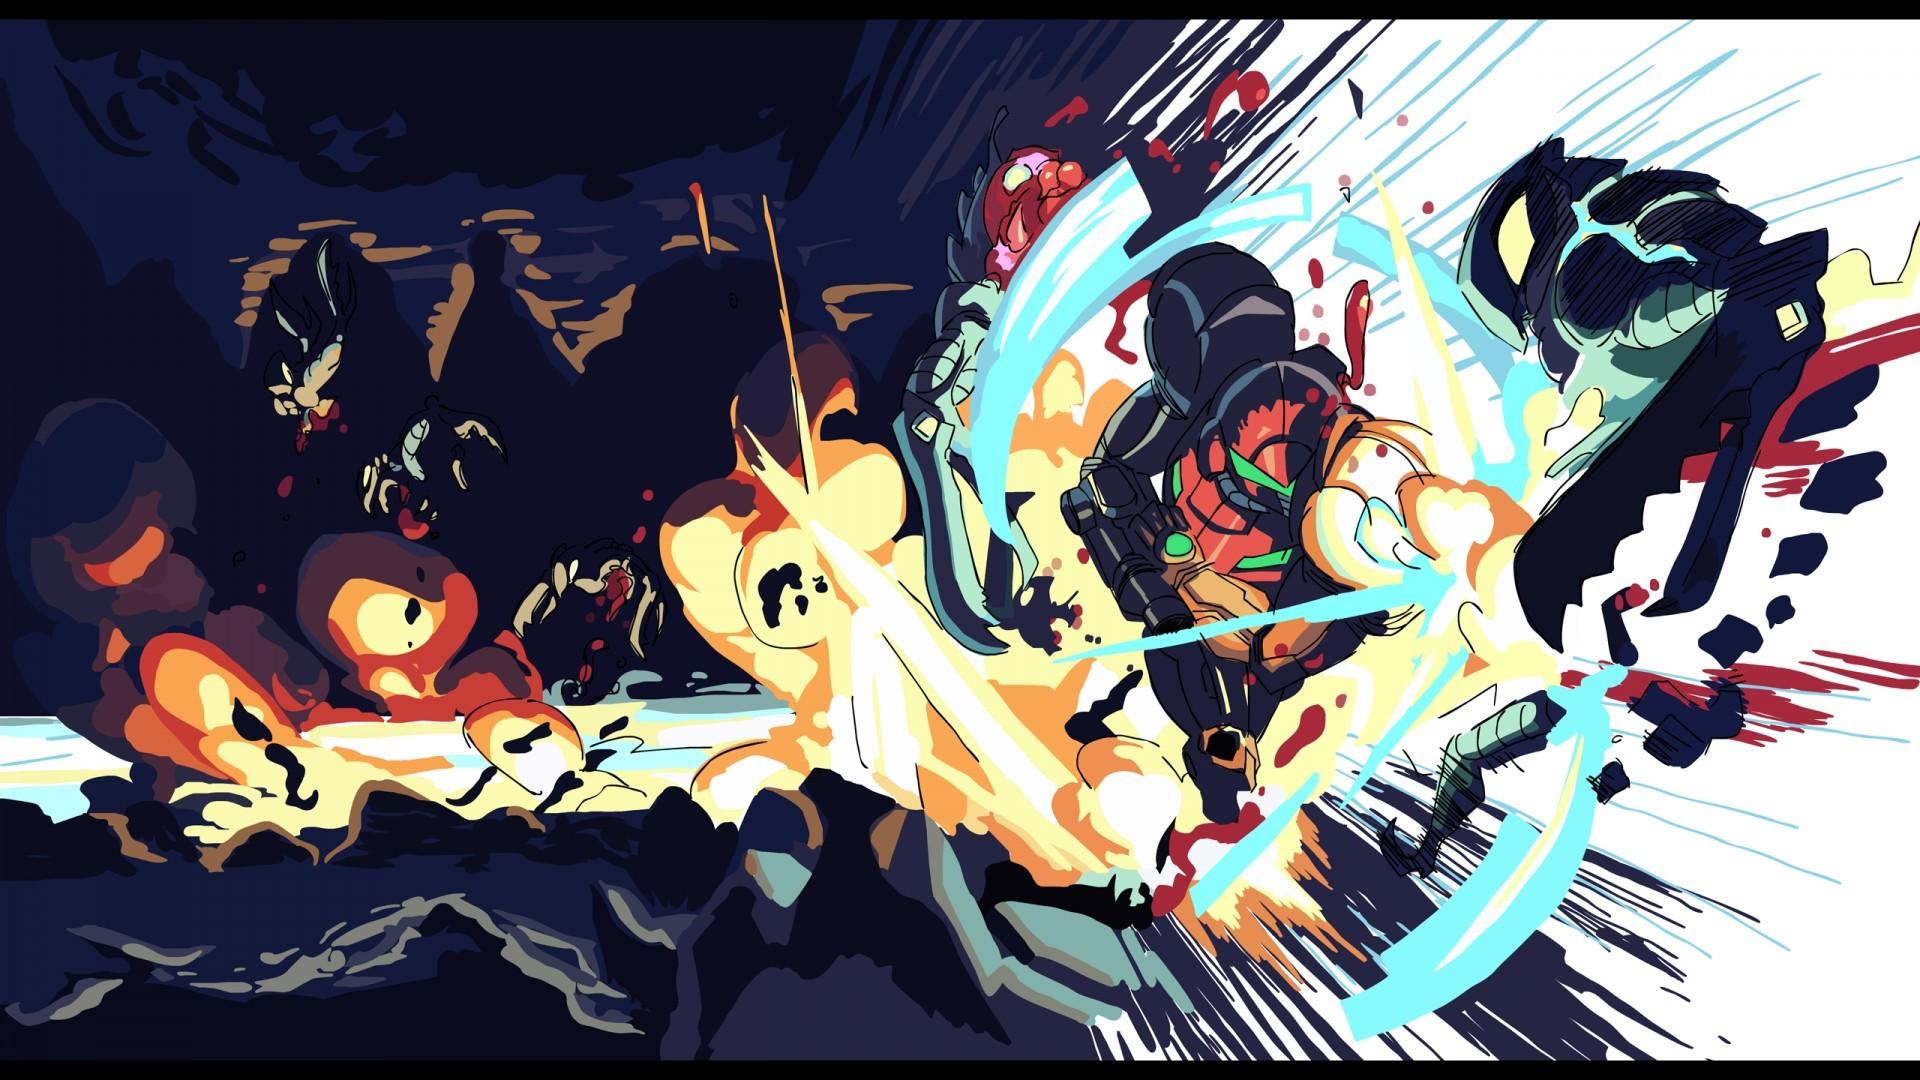 Games: Samus Aran Metroid Wallpaper Pictures Free for HD .